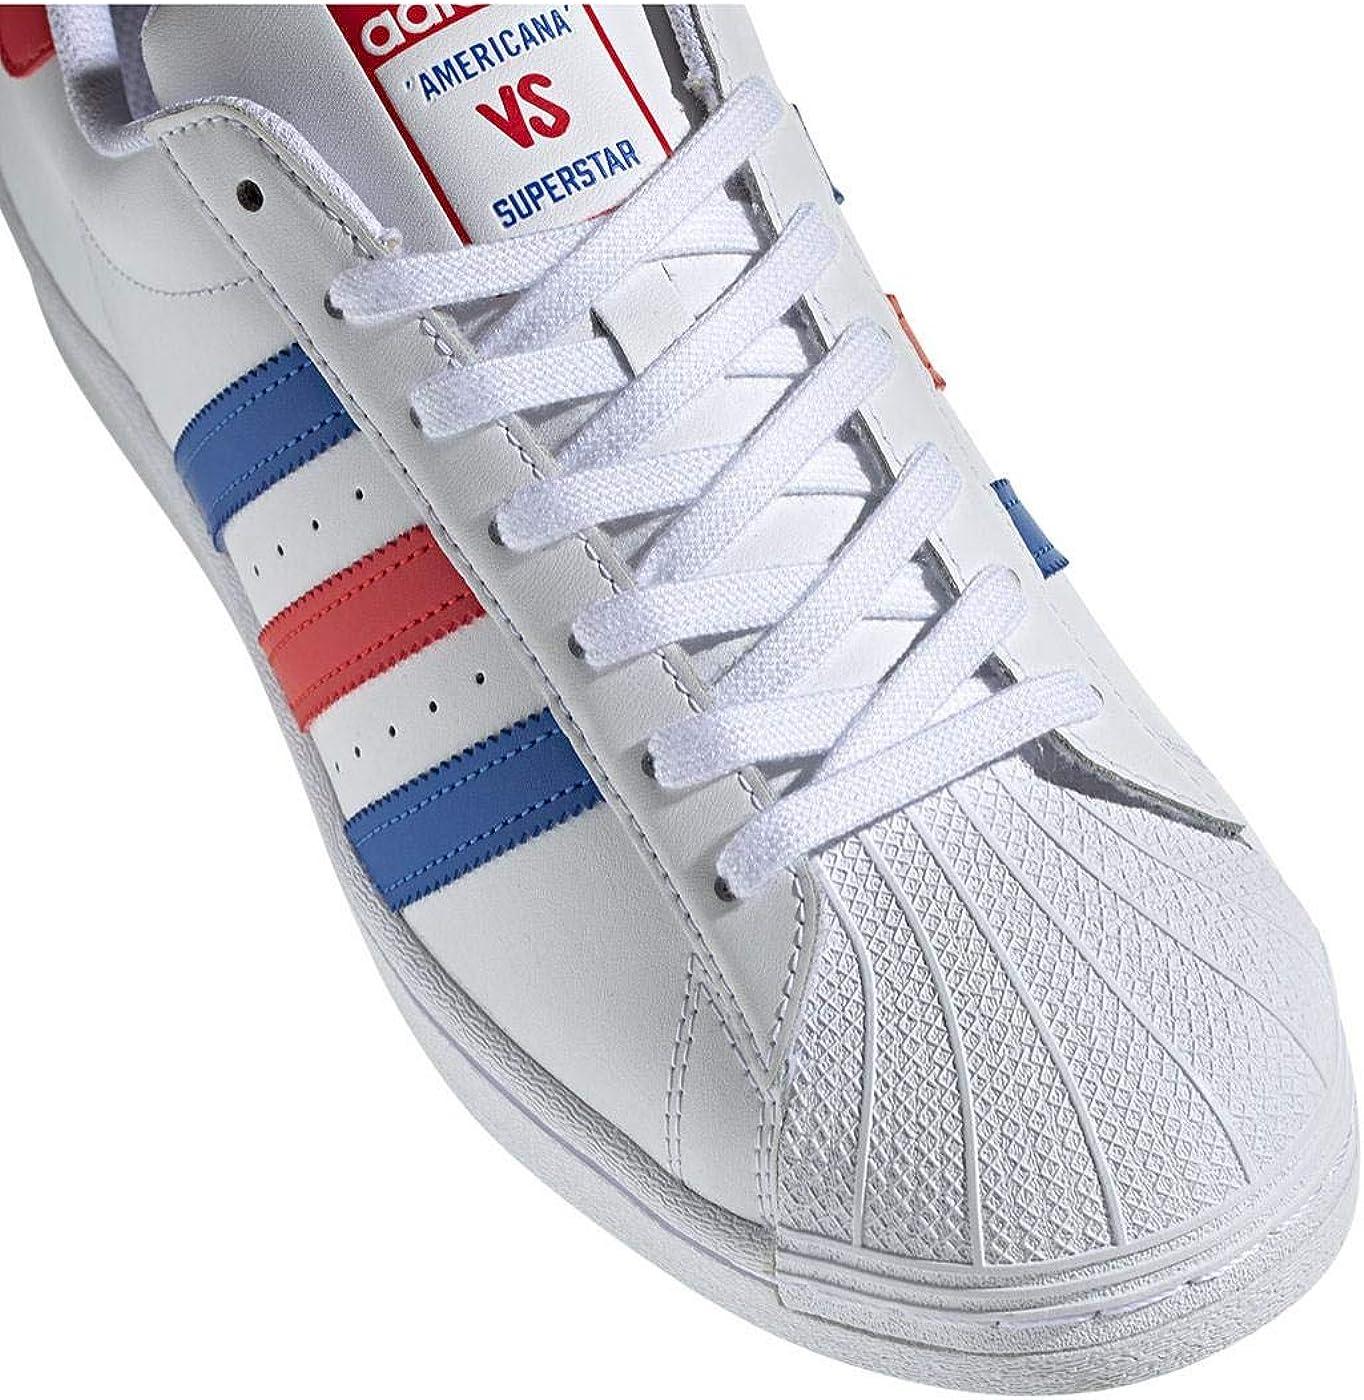 Adidas Superstar Chaussures pour Homme RougeBleu: